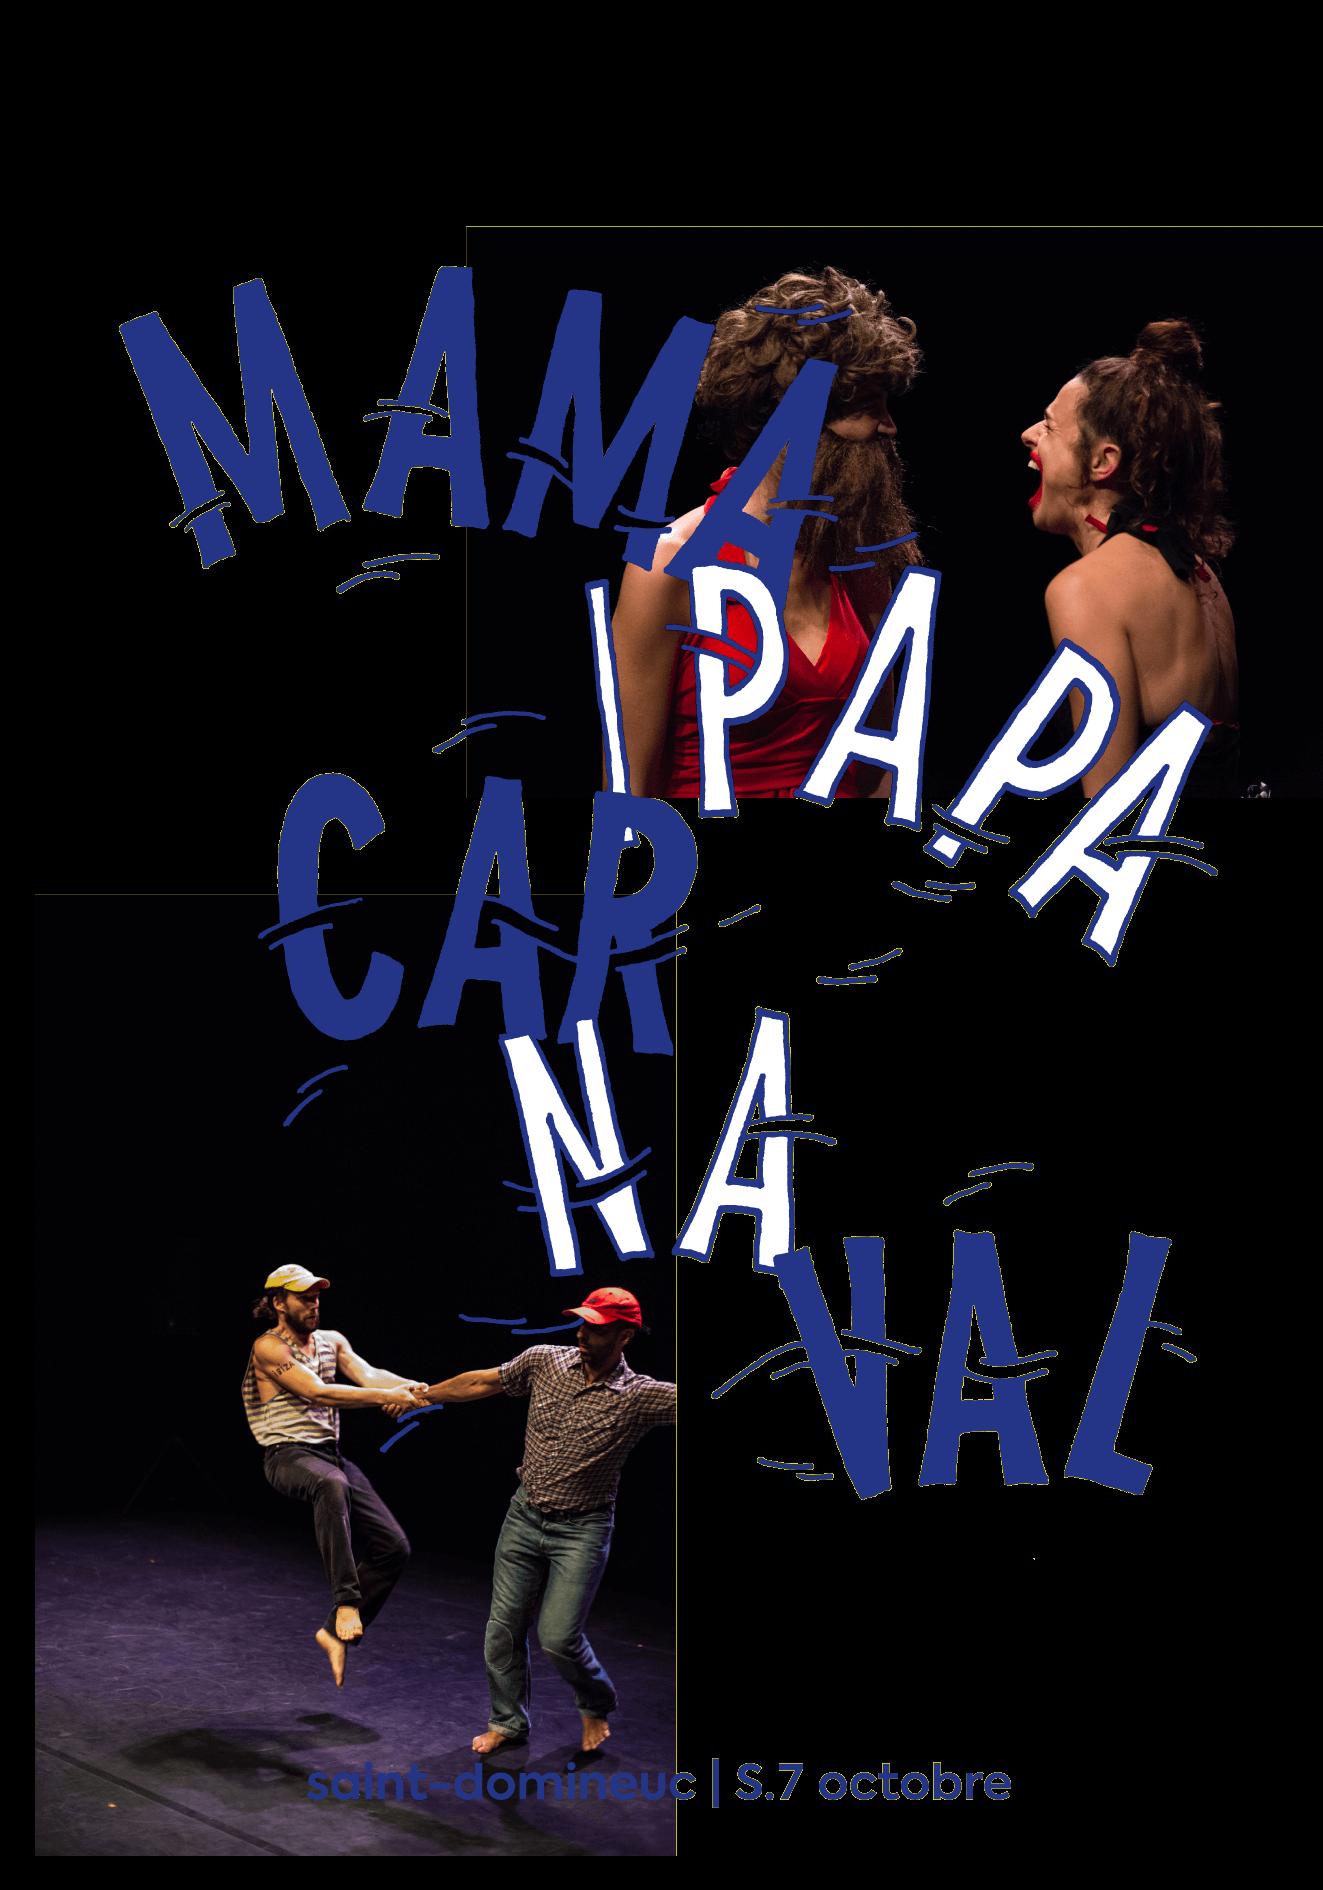 Mama/Papa Carnaval – octobre 2017